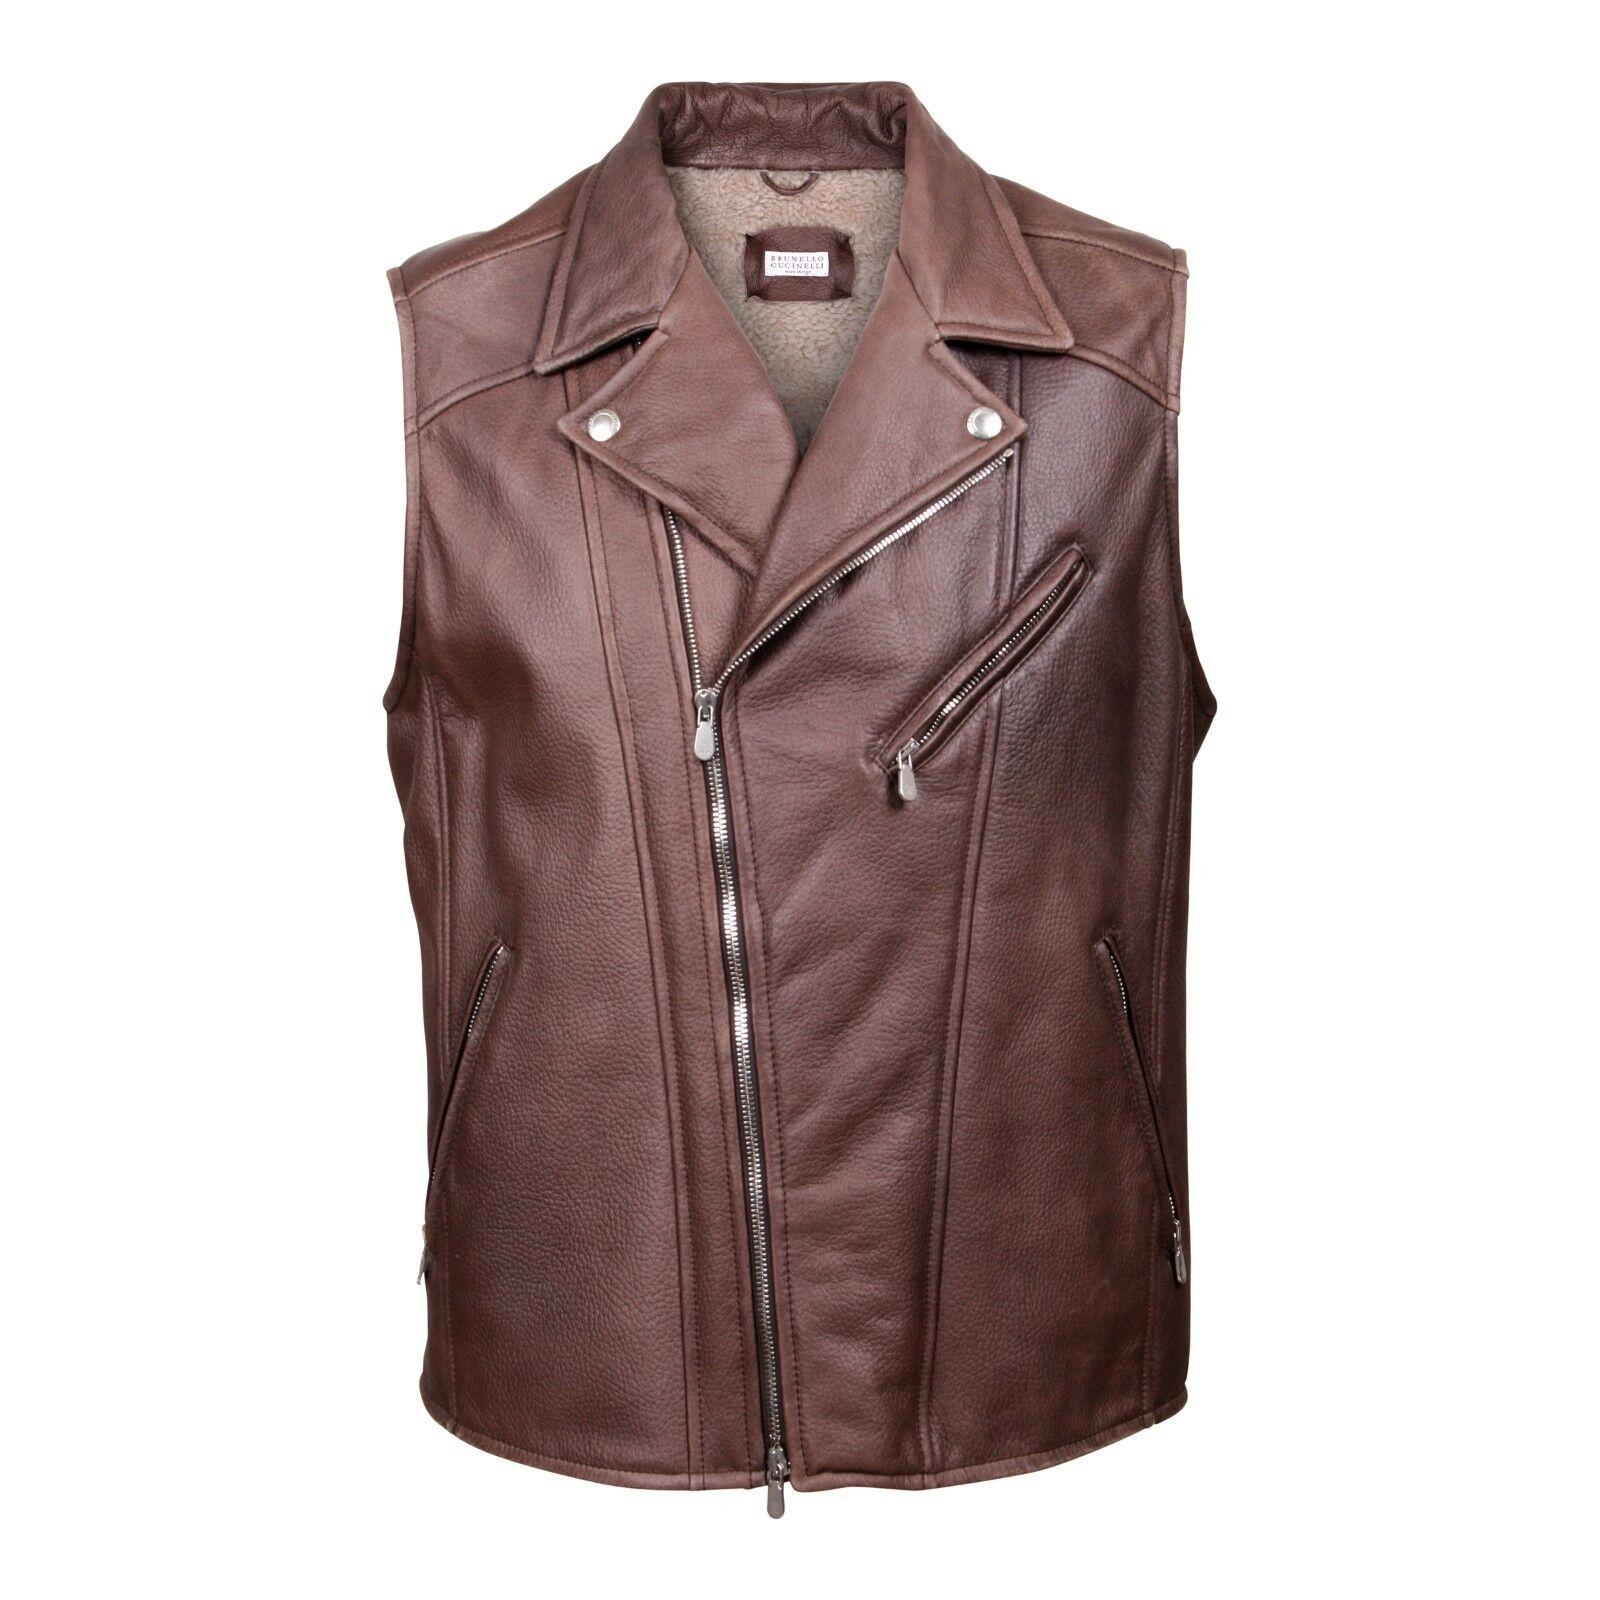 Brunello Cucinelli full fur lined Leder motto vest NEW XL 4995